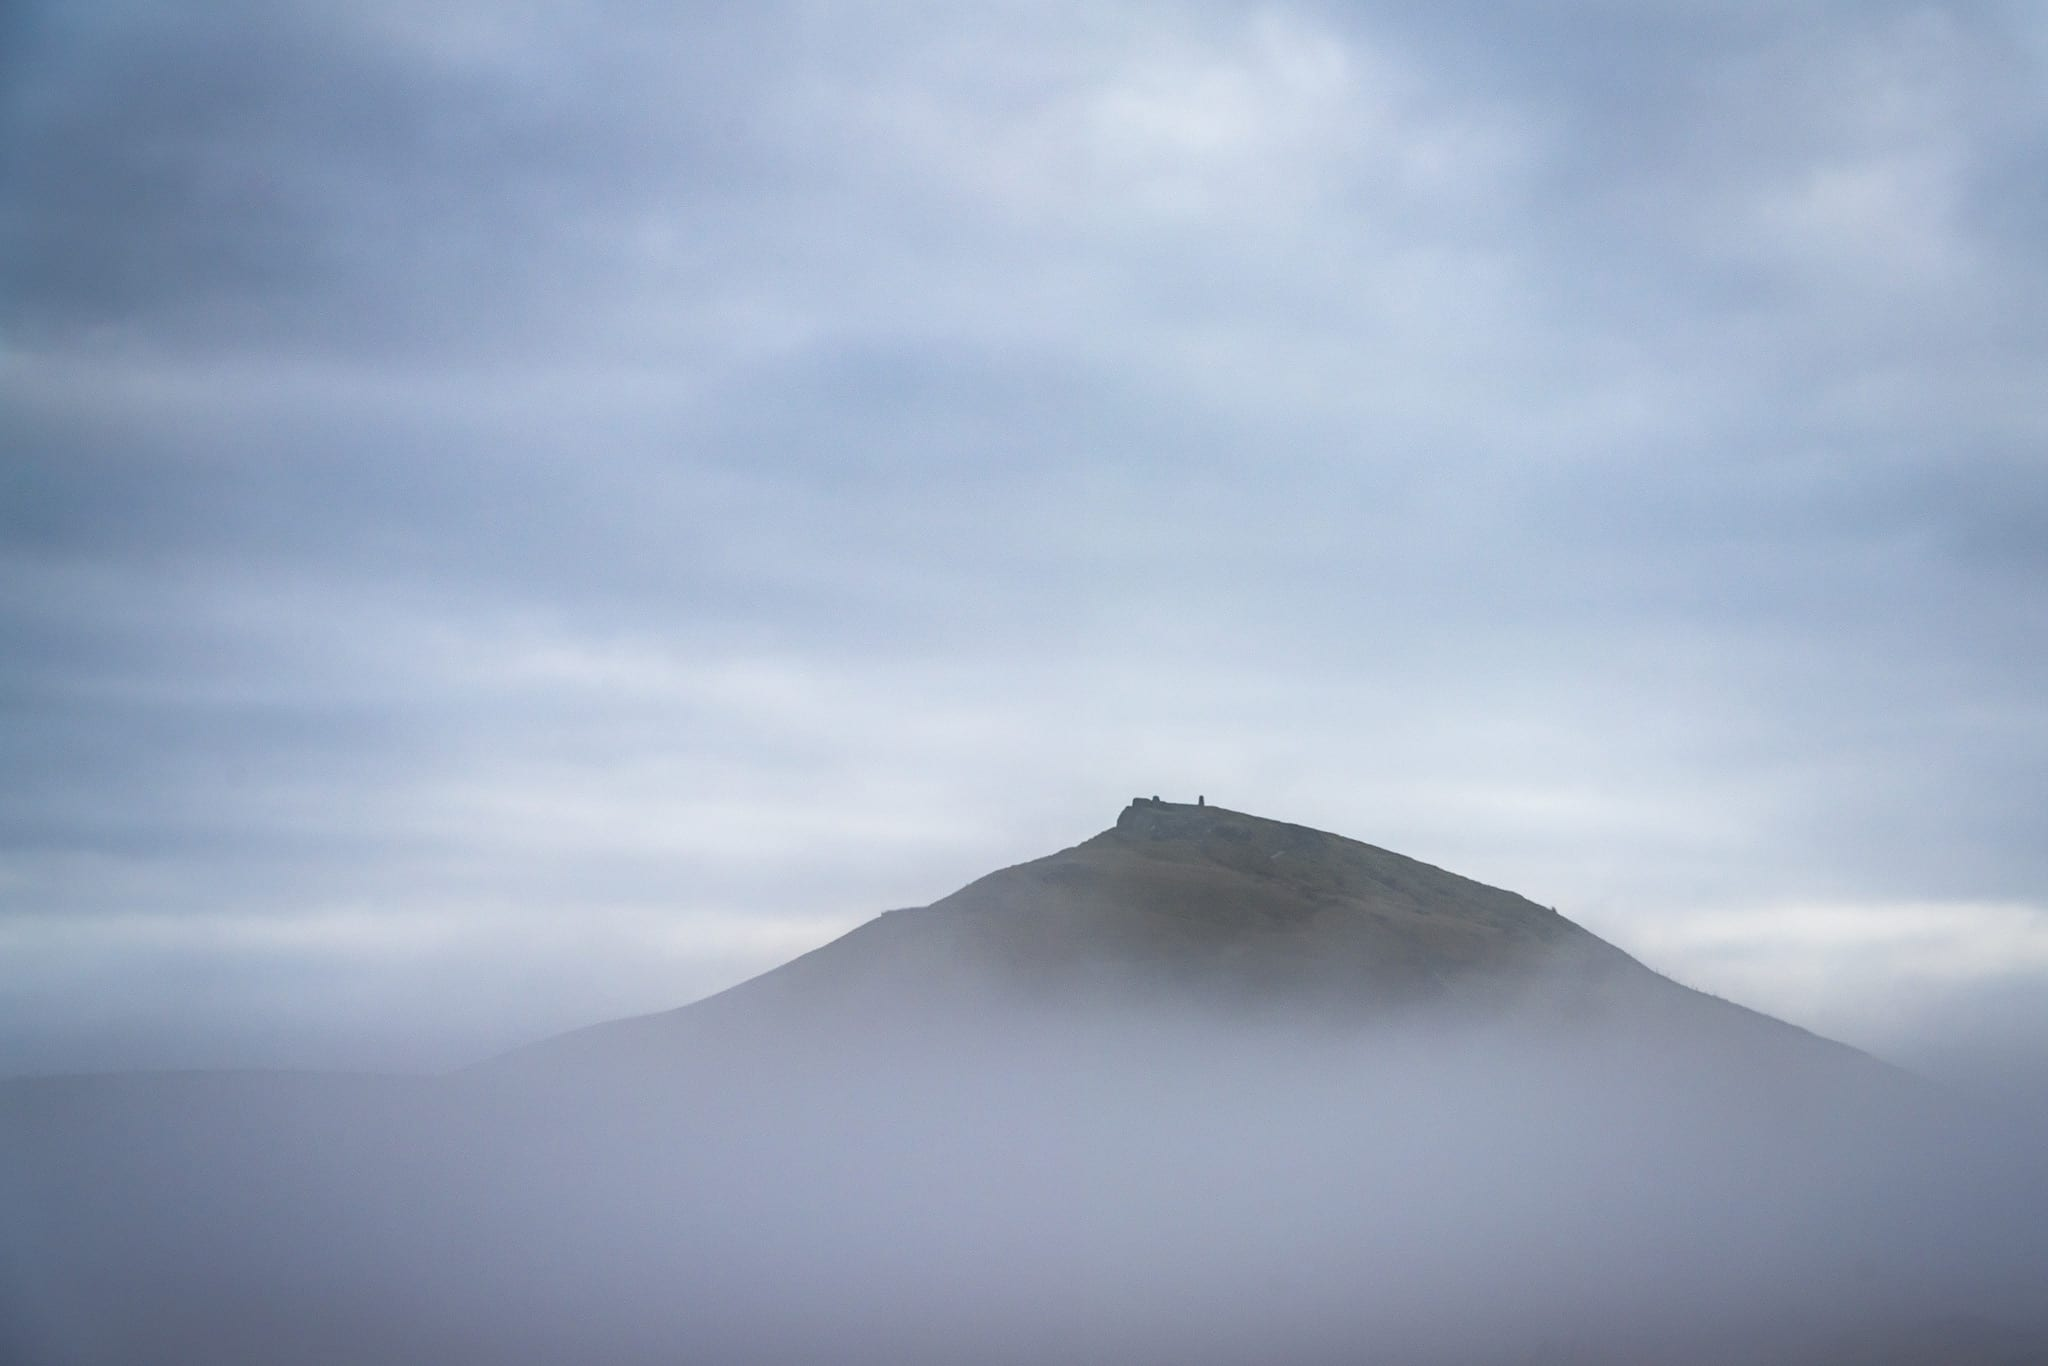 Shutlingsloe above the Cloud – Peak District Photography